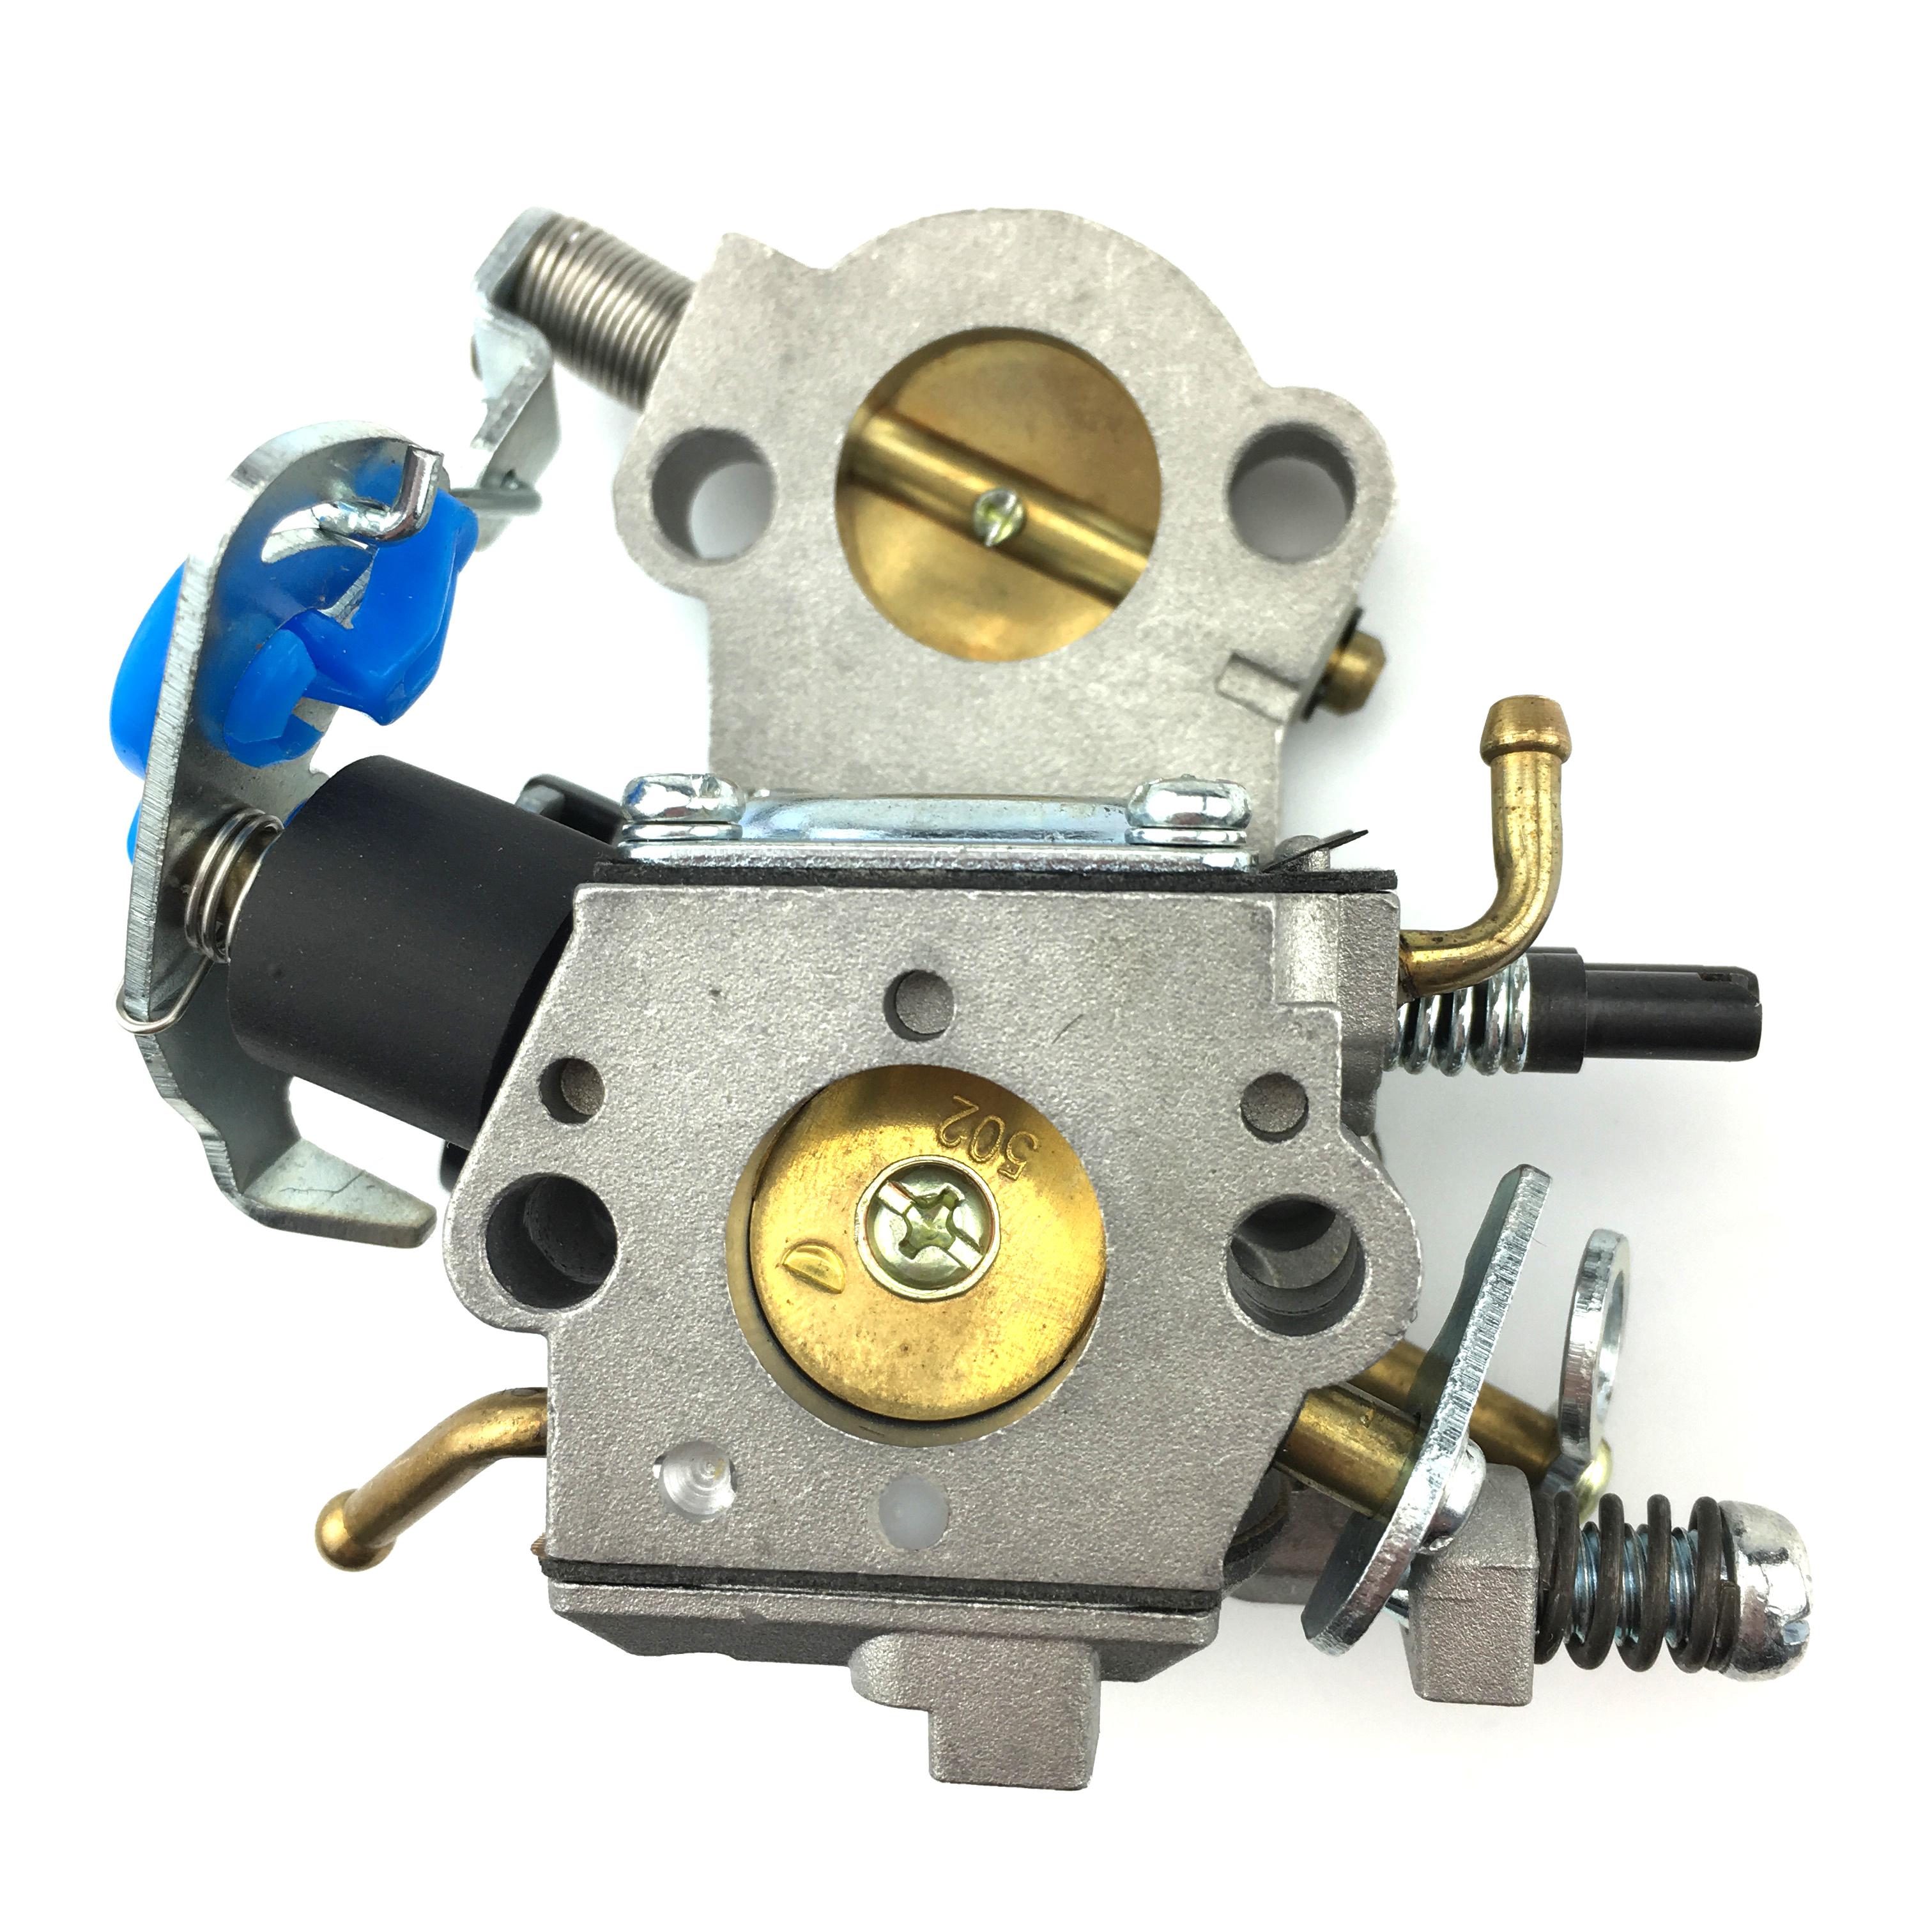 walbro chainsaw carburetor parts circuit diagram maker. Black Bedroom Furniture Sets. Home Design Ideas